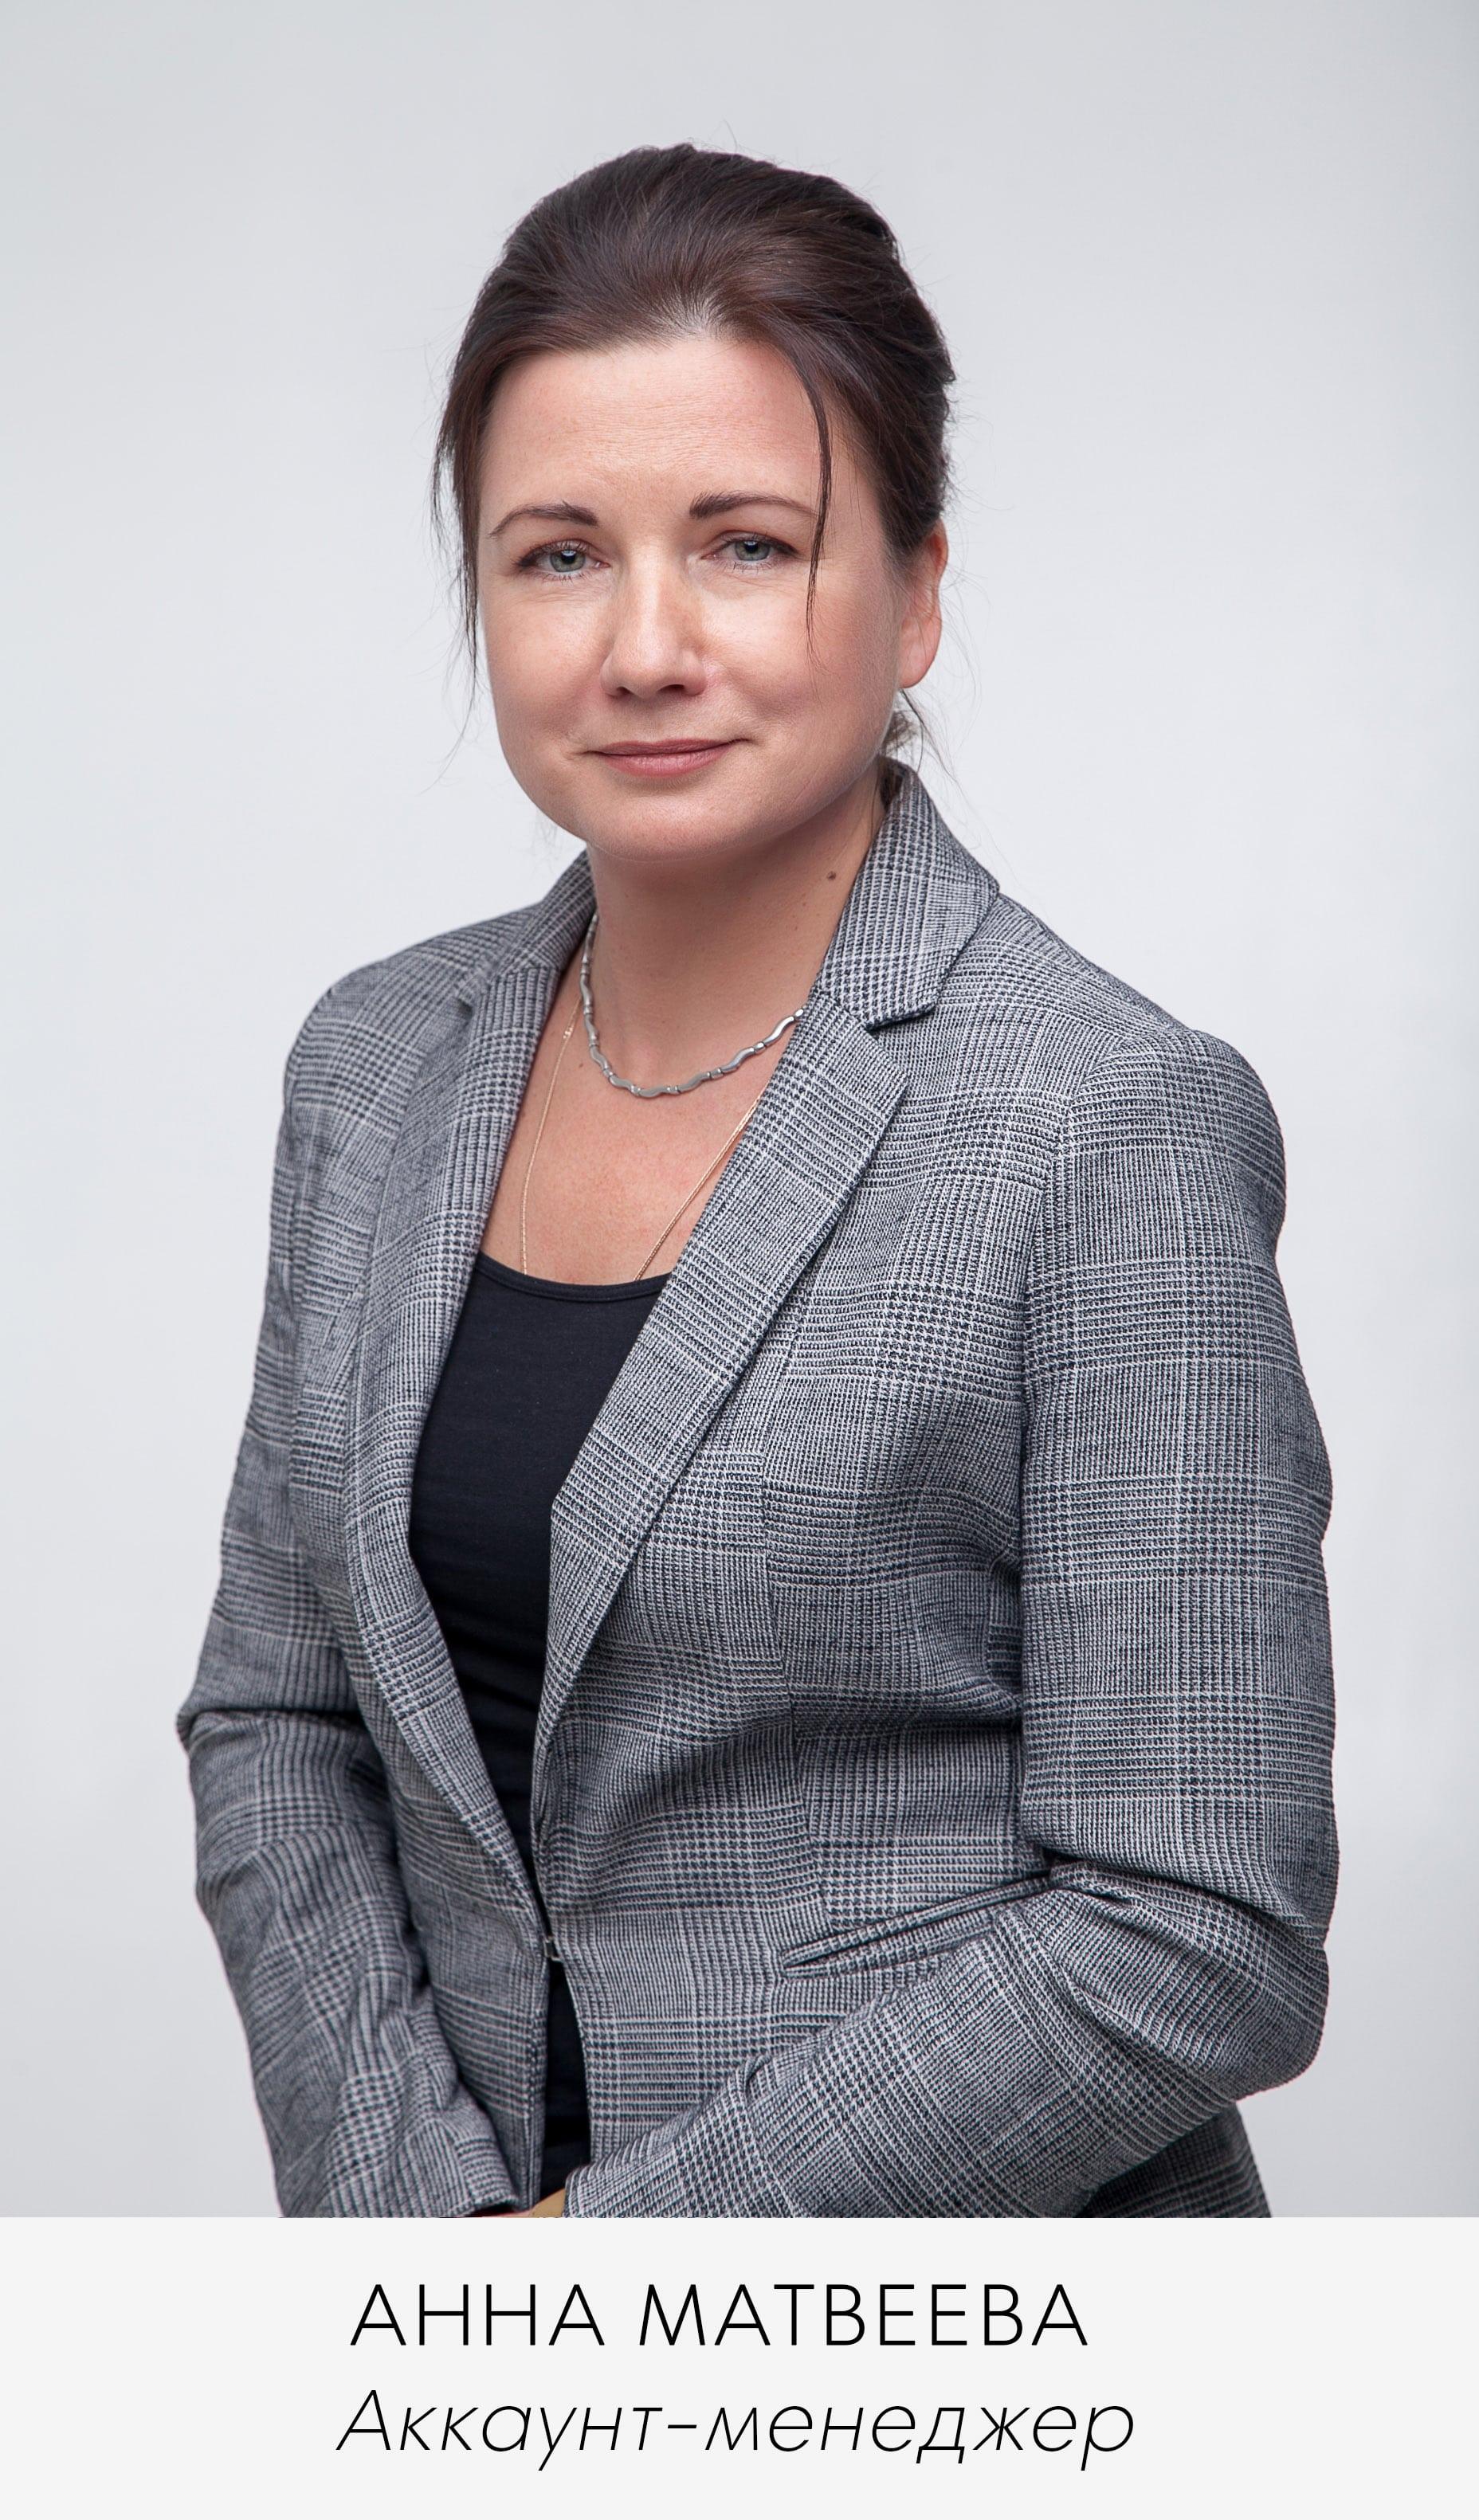 Anna-Matveeva-account-manager-1-min.jpg